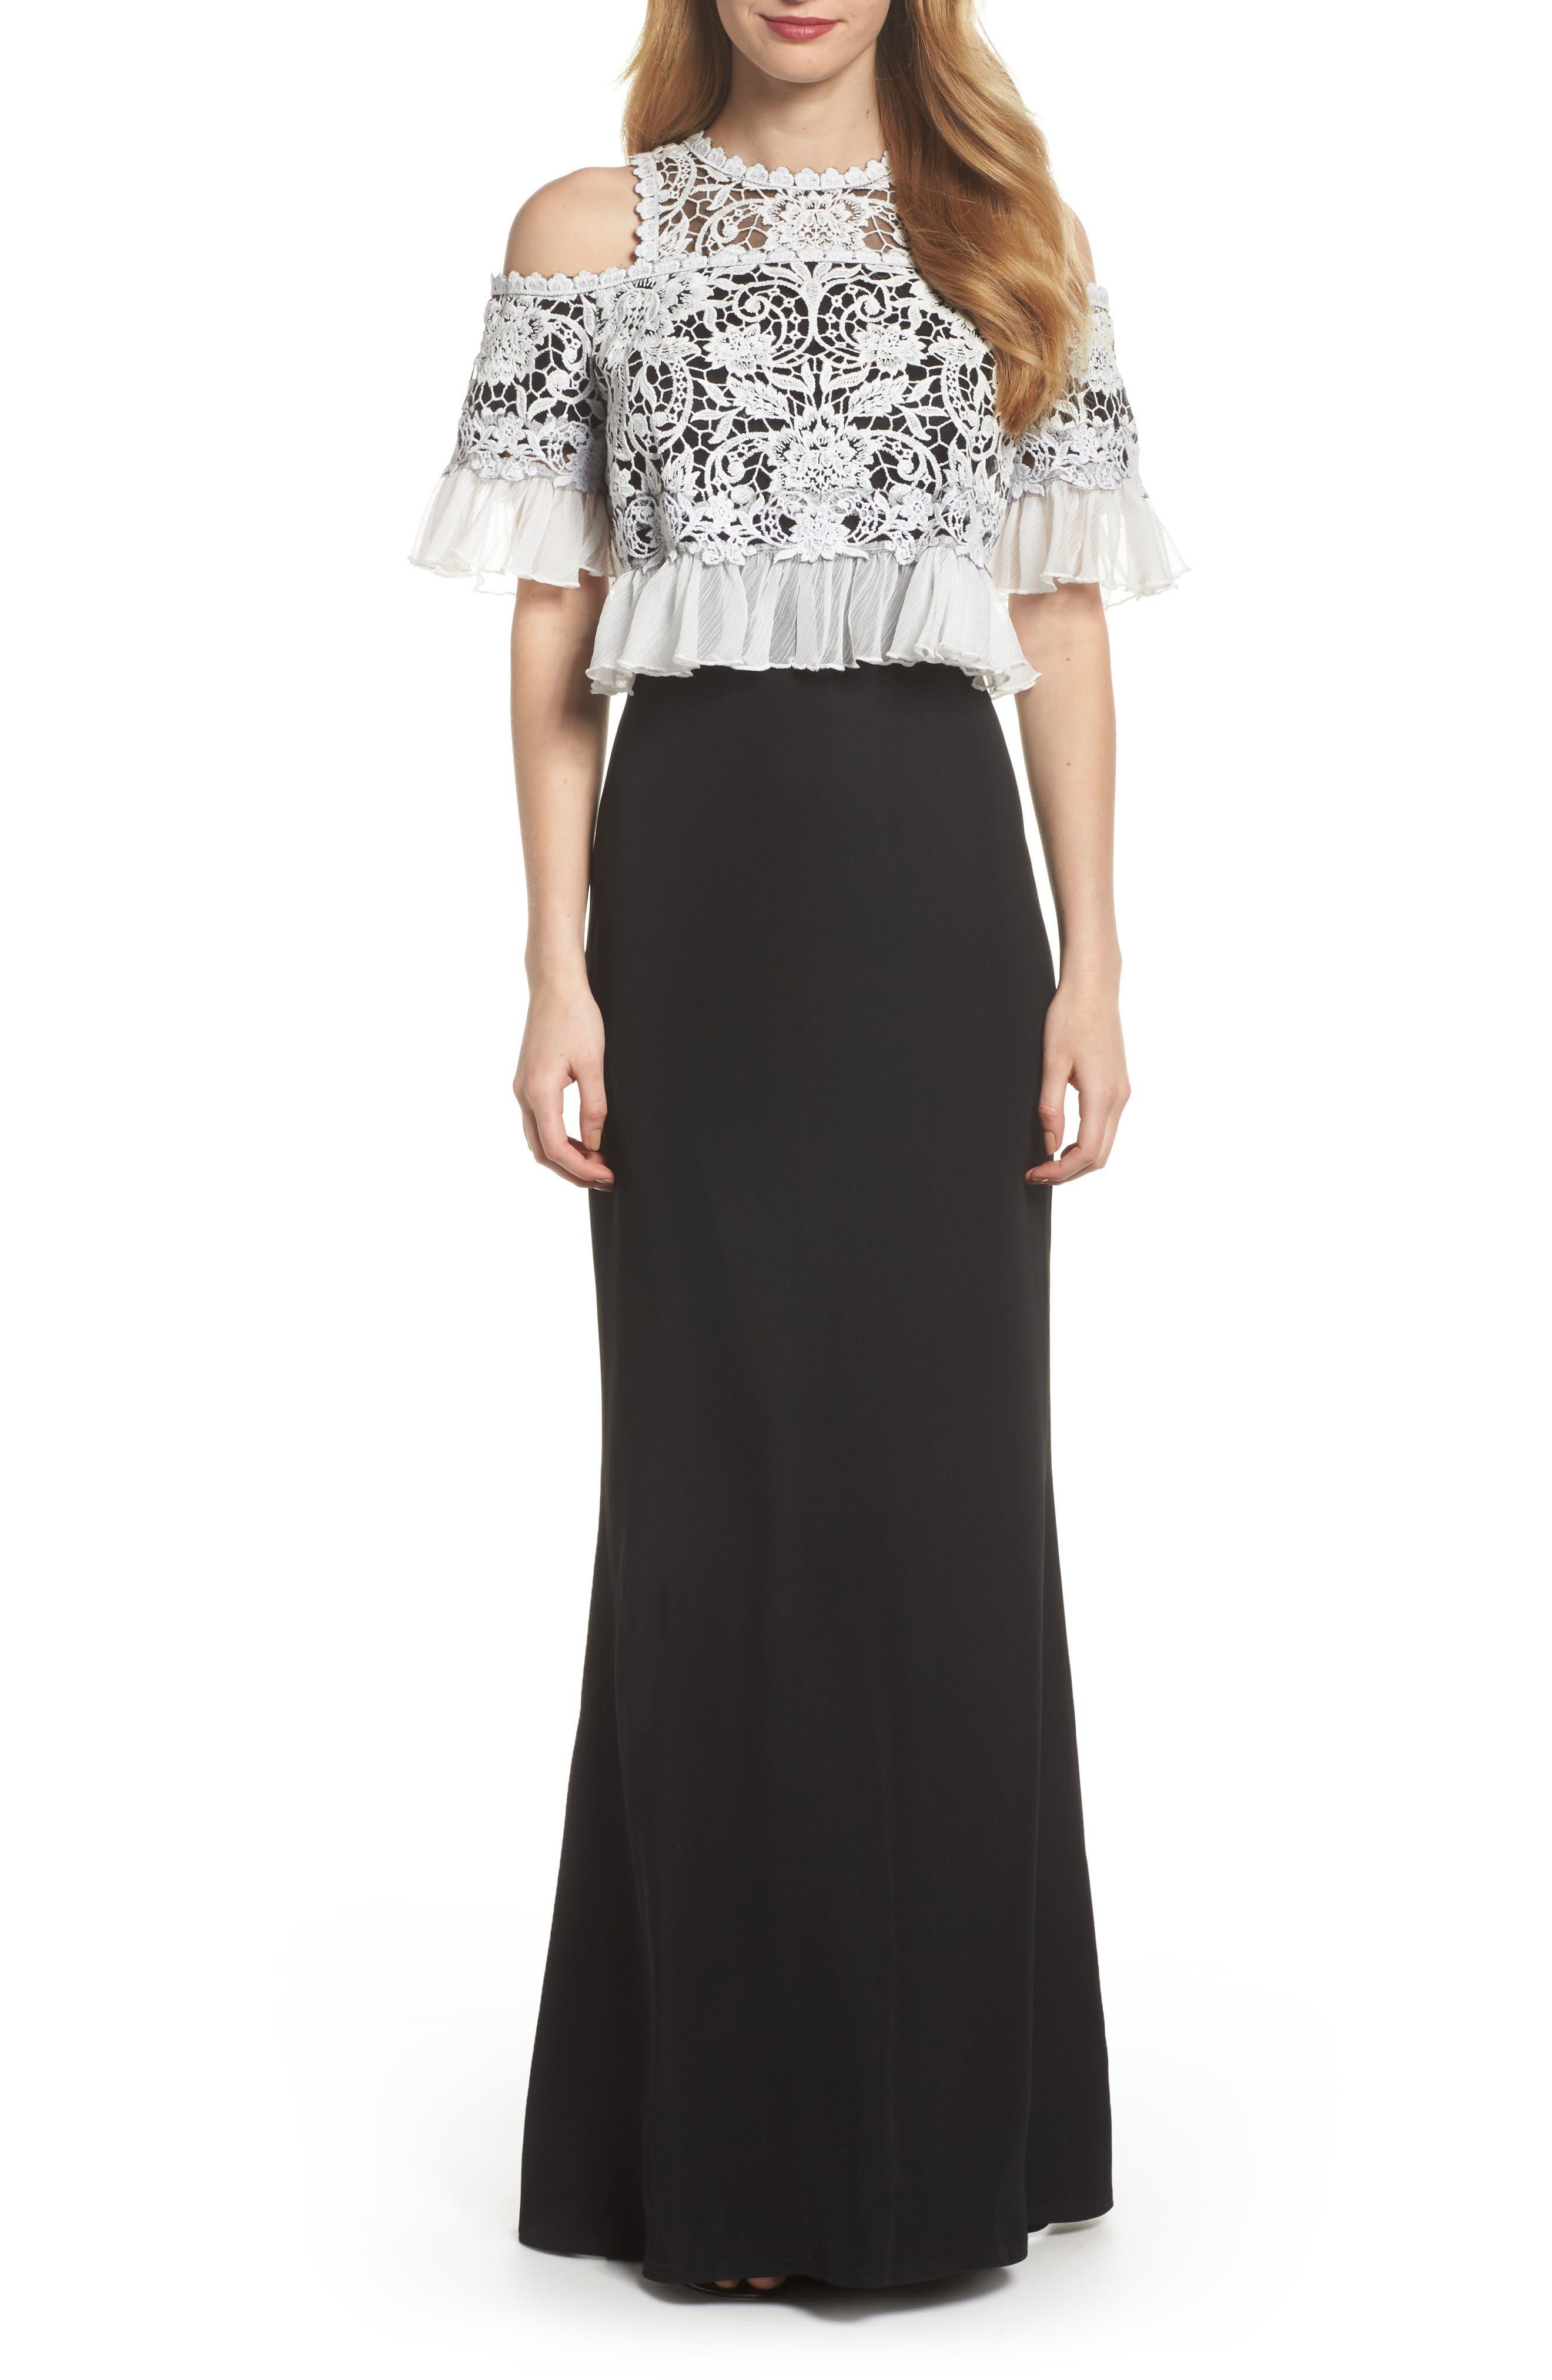 Crochet Bodice Gown,                             Main thumbnail 1, color,                             Black/ Ivory